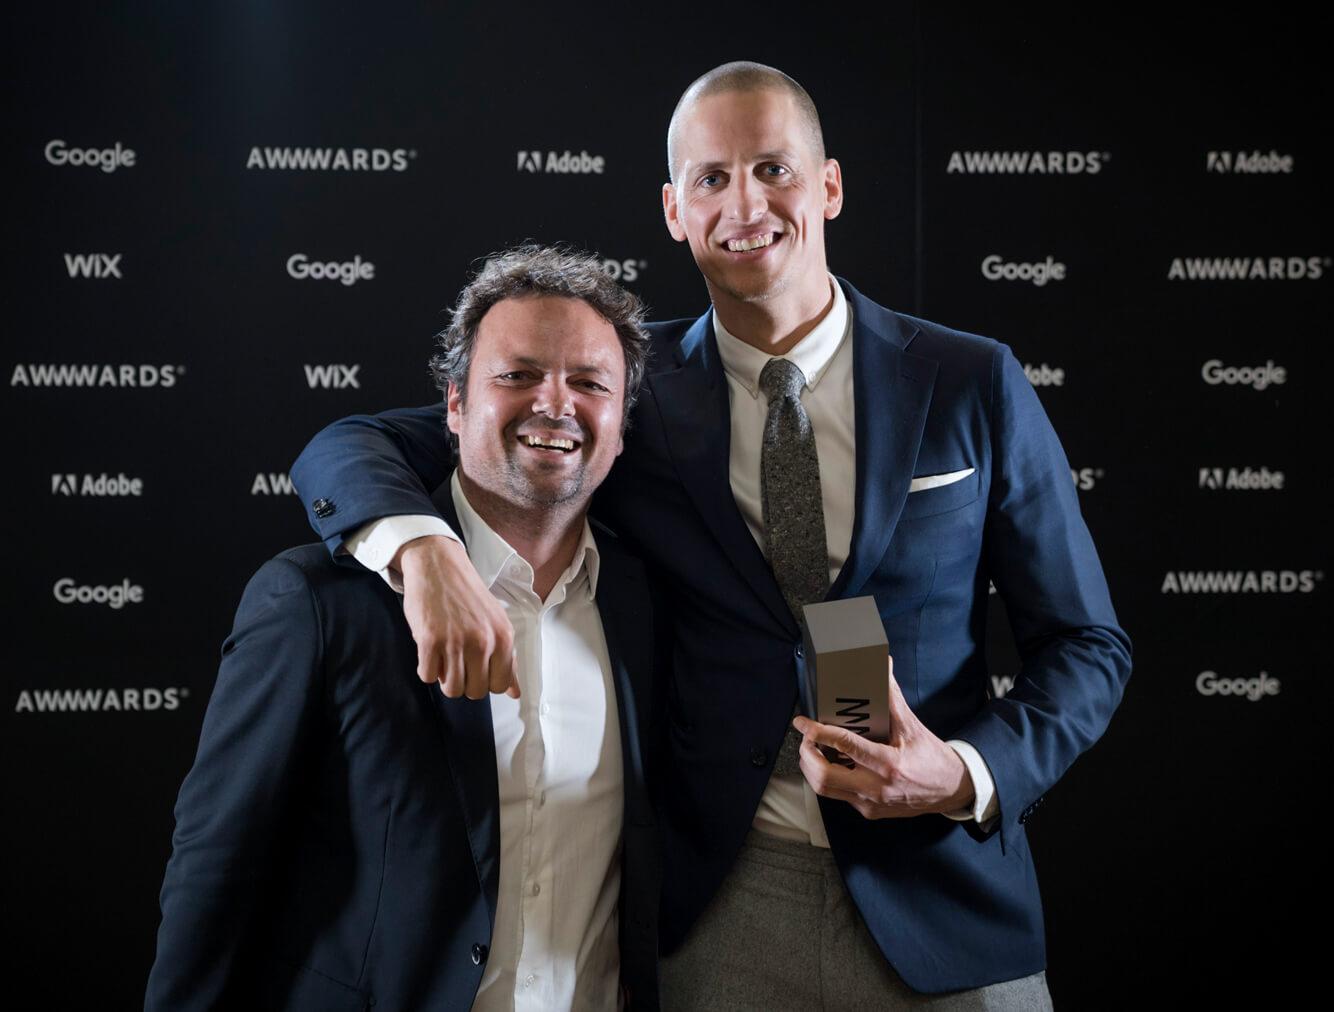 Annual Awards 2017 - Awwwards